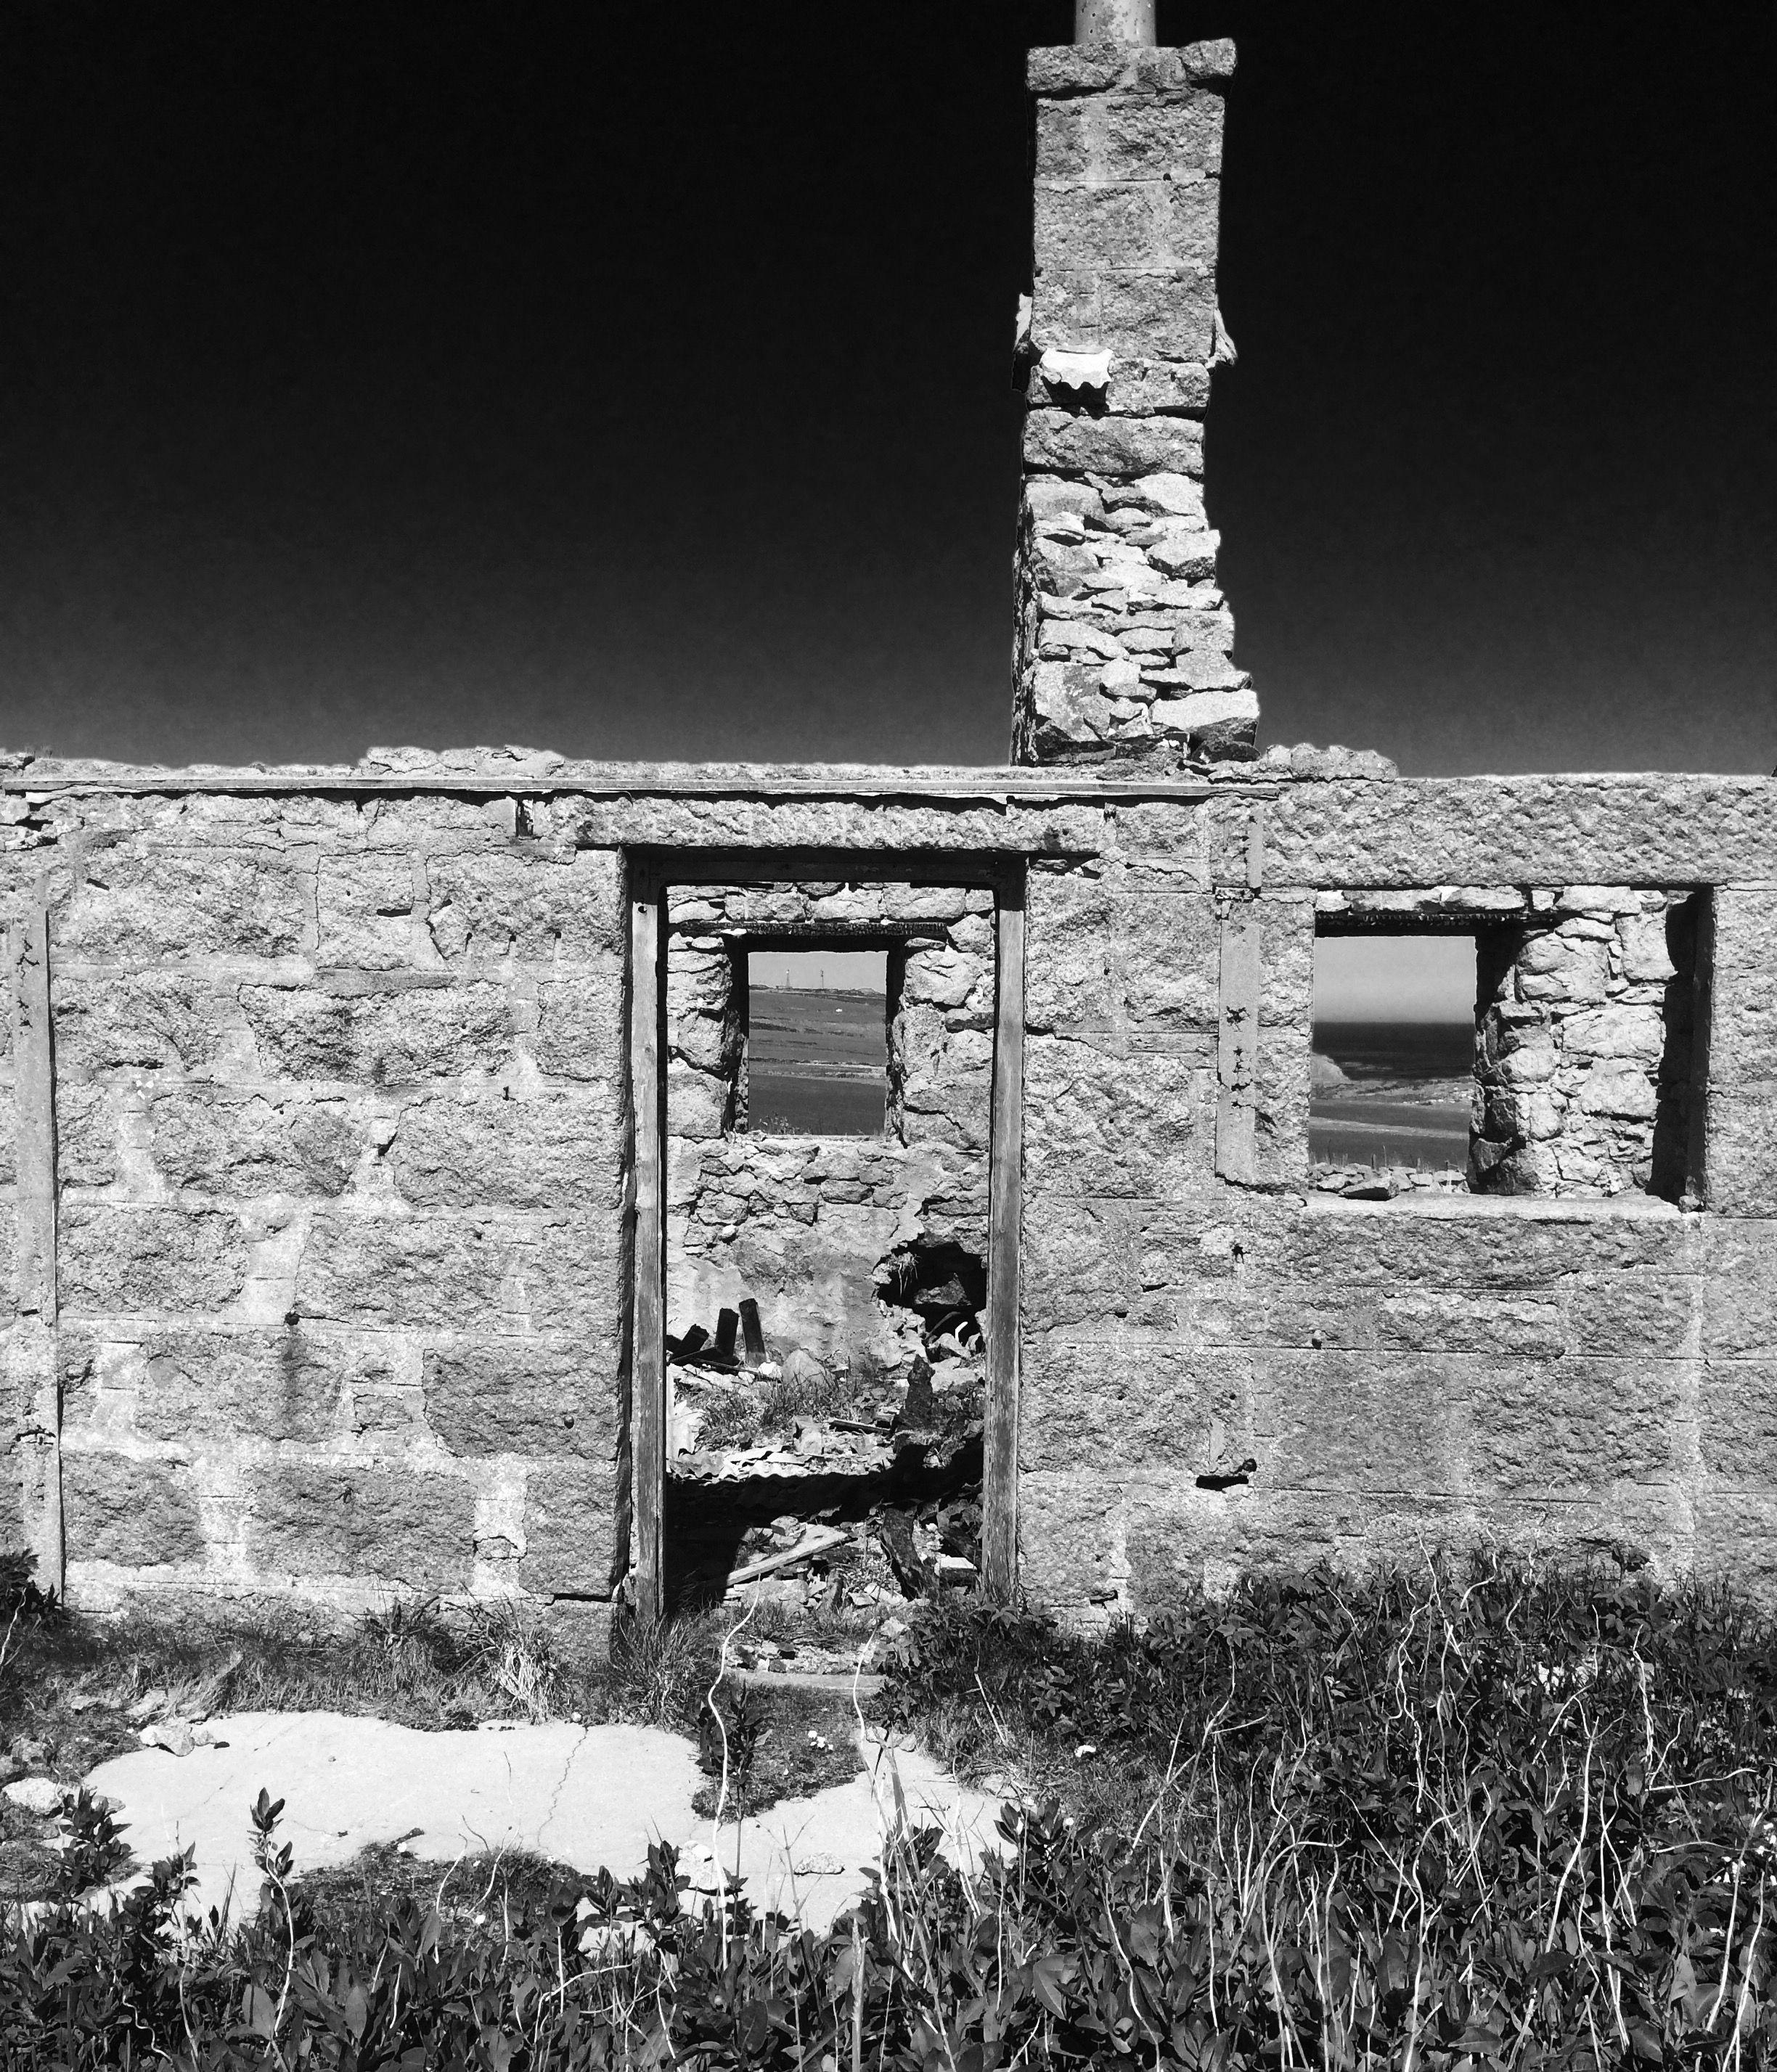 House ruin, long haven cliffs scotland